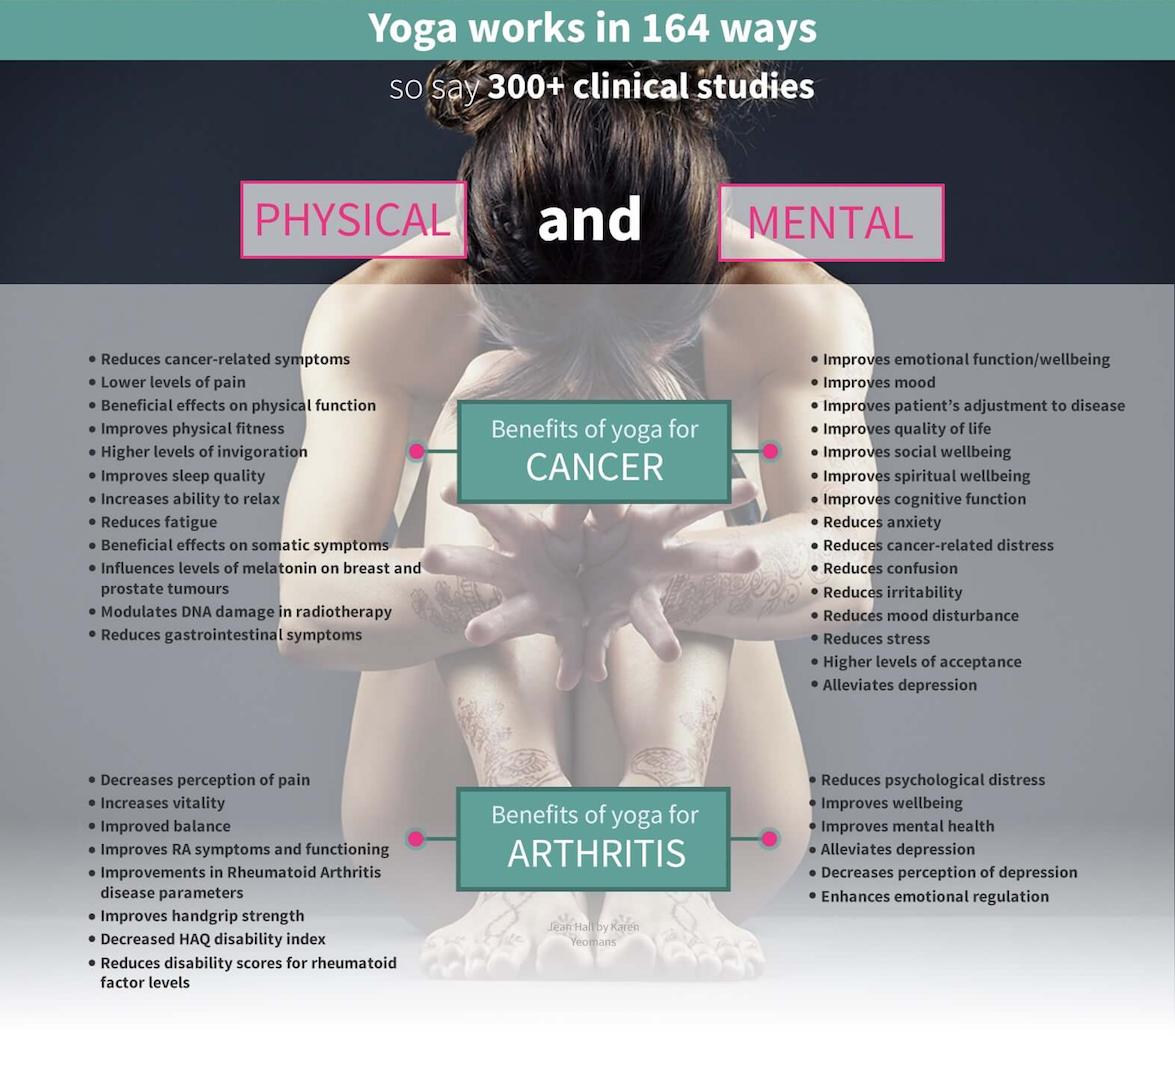 Yoga Works in 164 Ways.